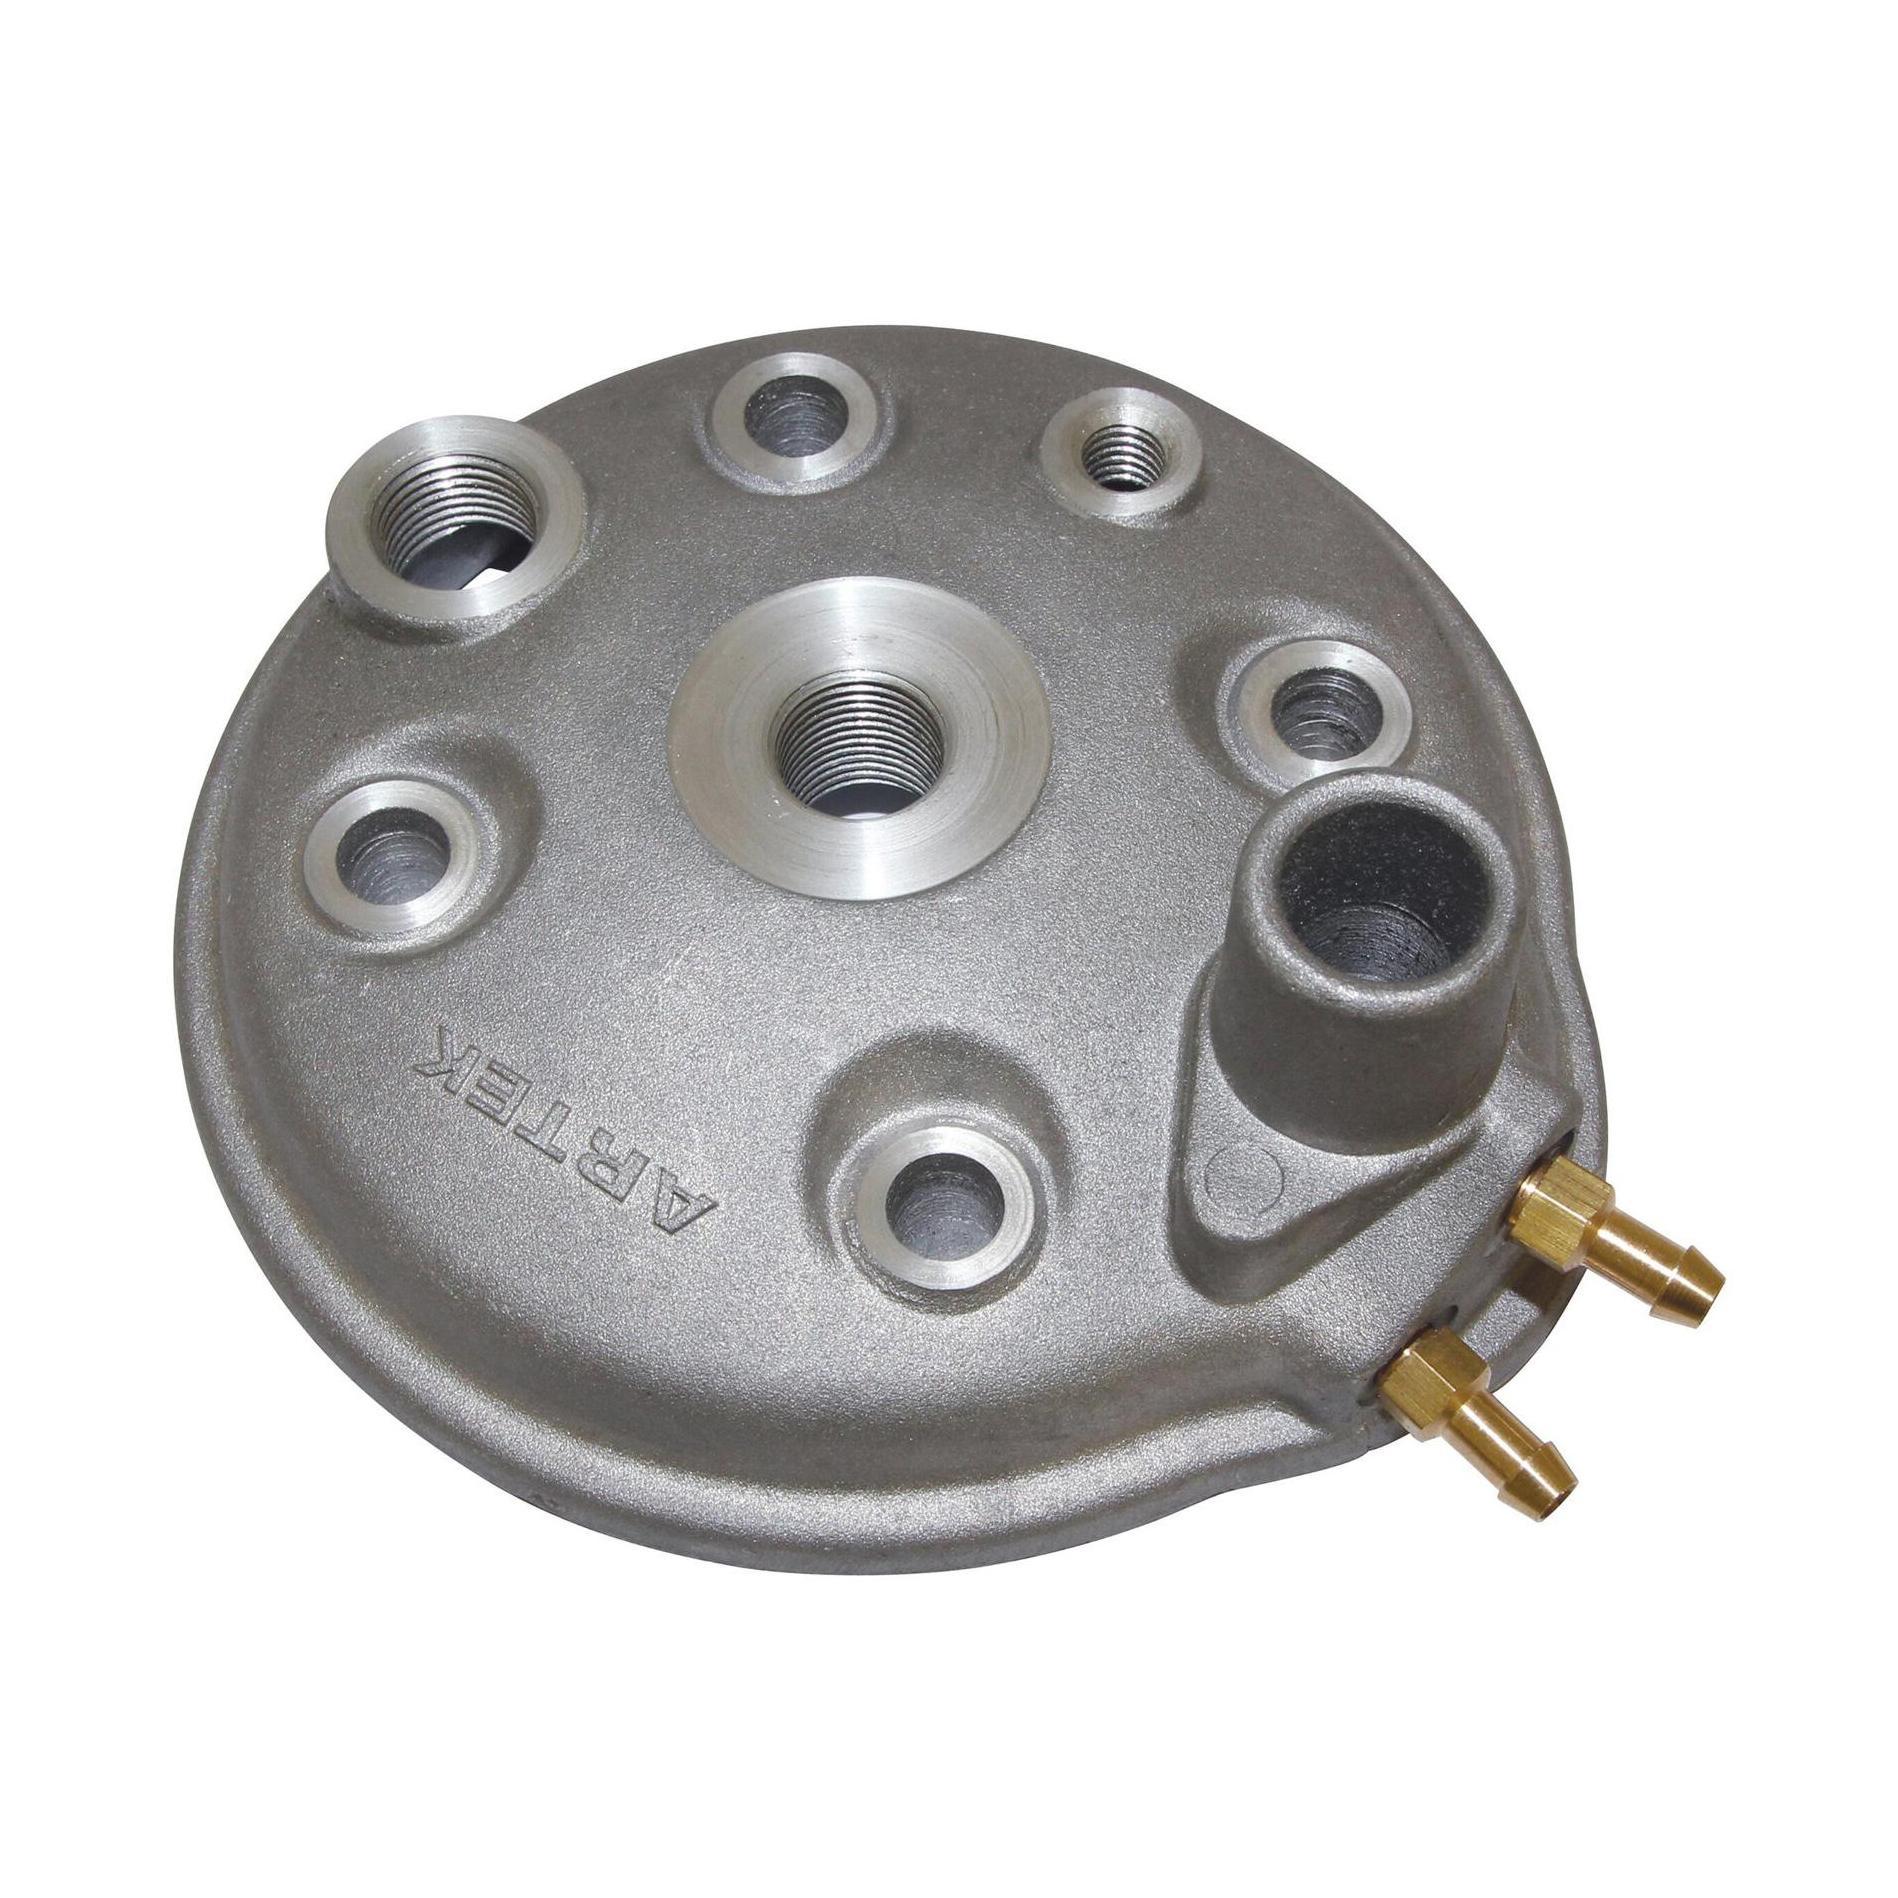 Culasse Artek K1 pour cylindre fonte Minarelli AM6